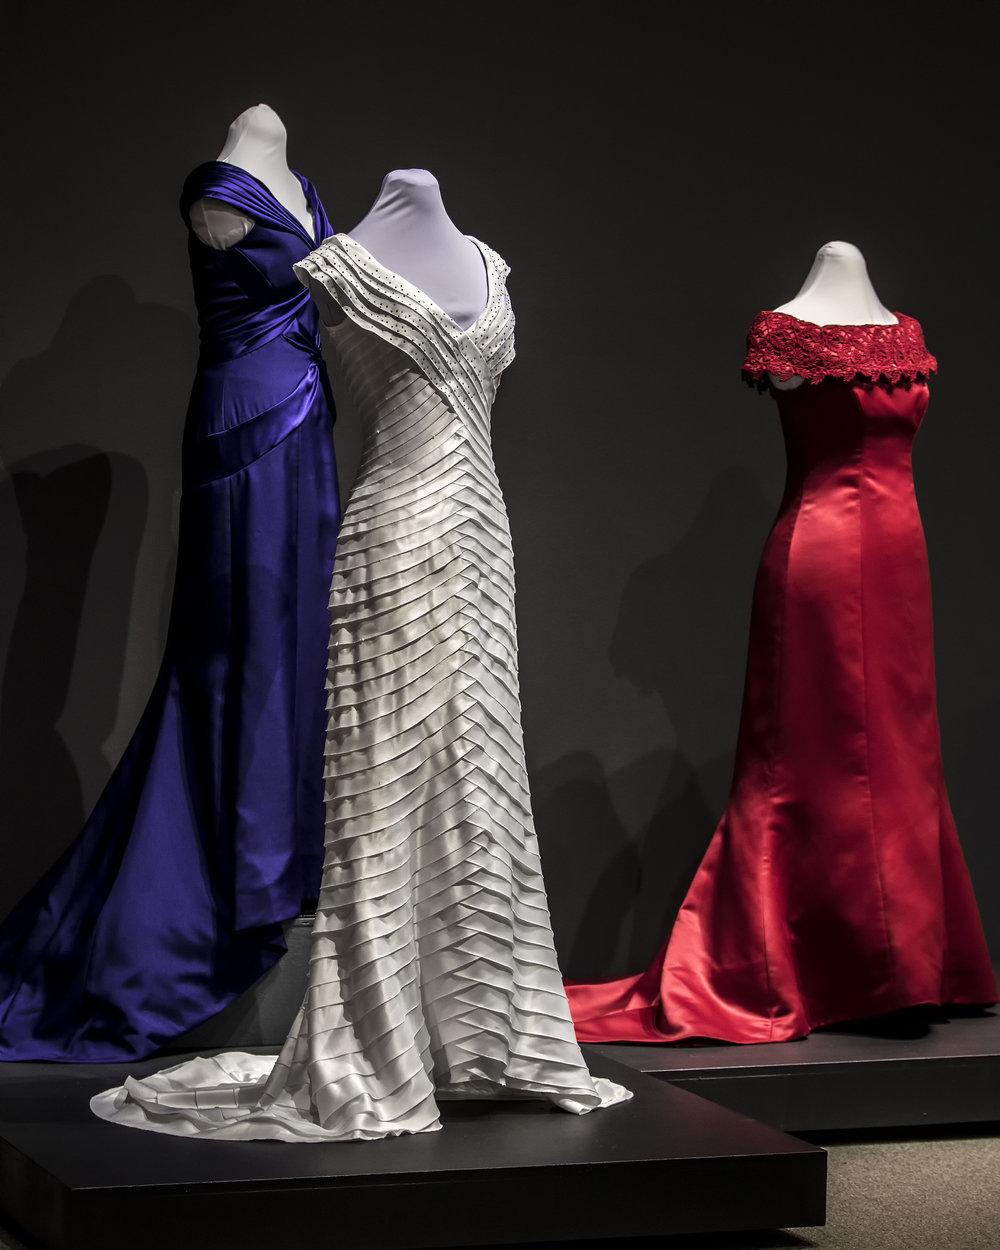 3 dresses Royals.jpg